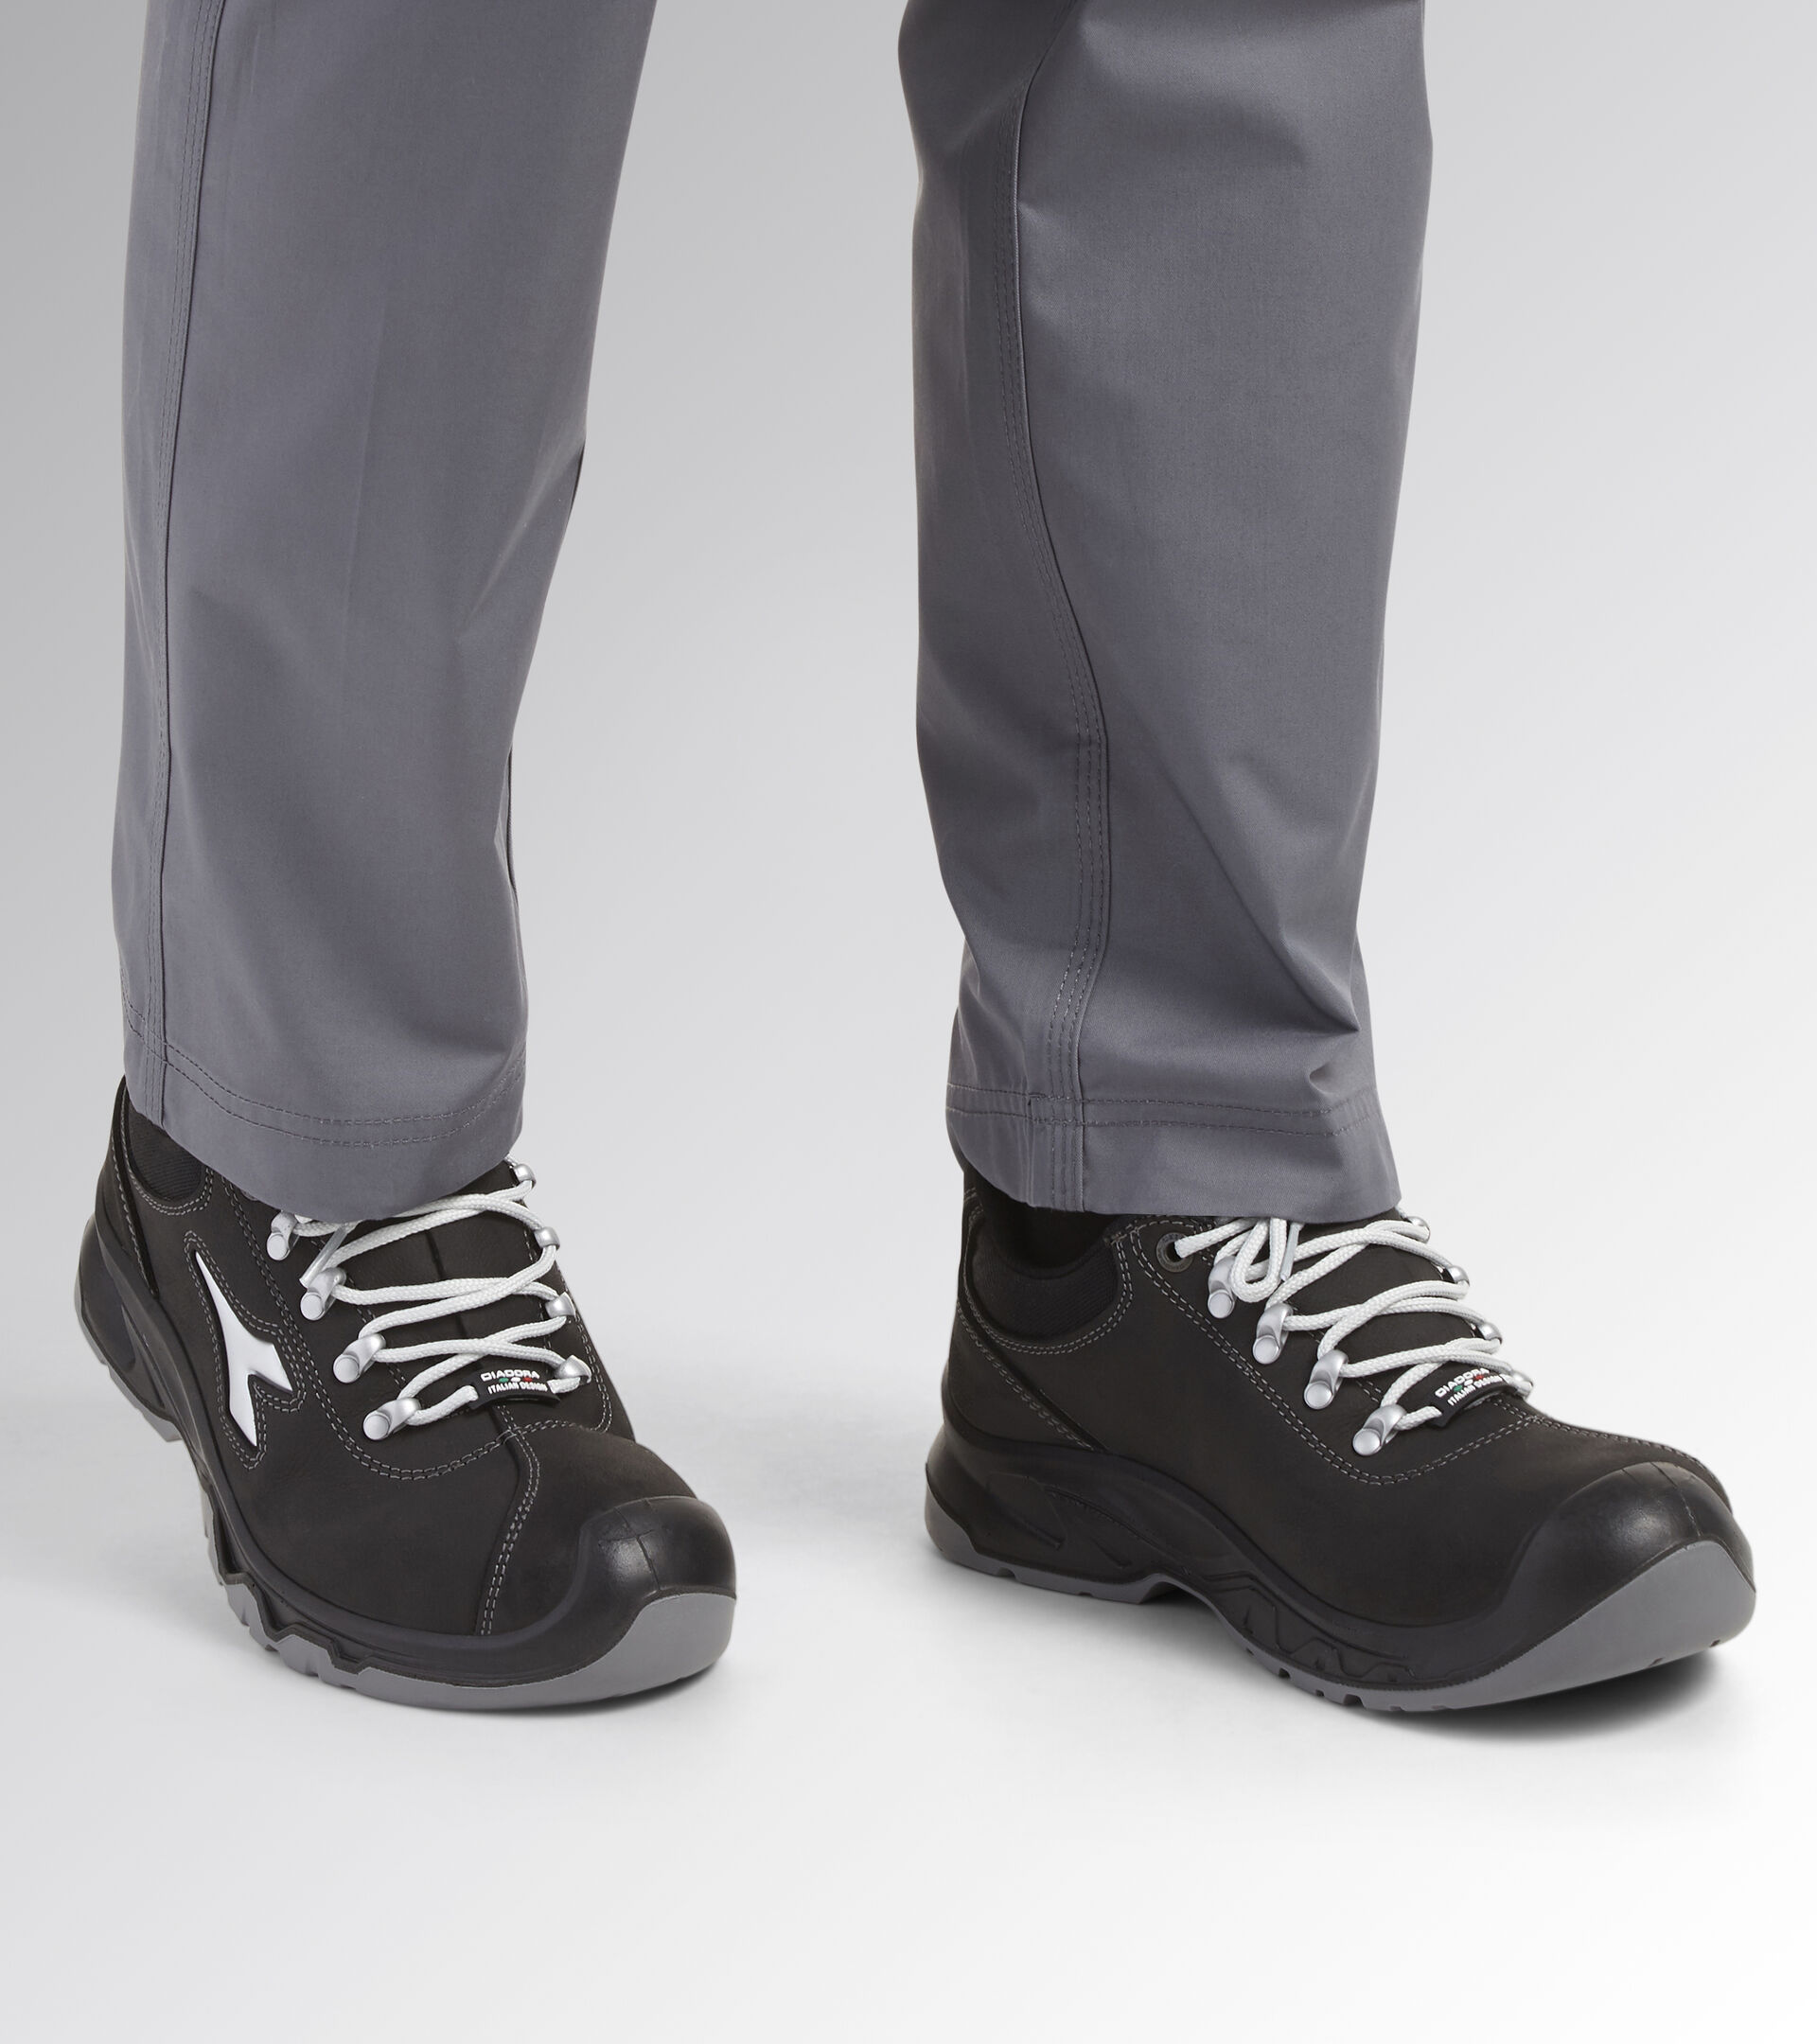 Footwear Utility UNISEX DIABLO WINTHERM LOW S3 CI SRC SCHWARZ Utility